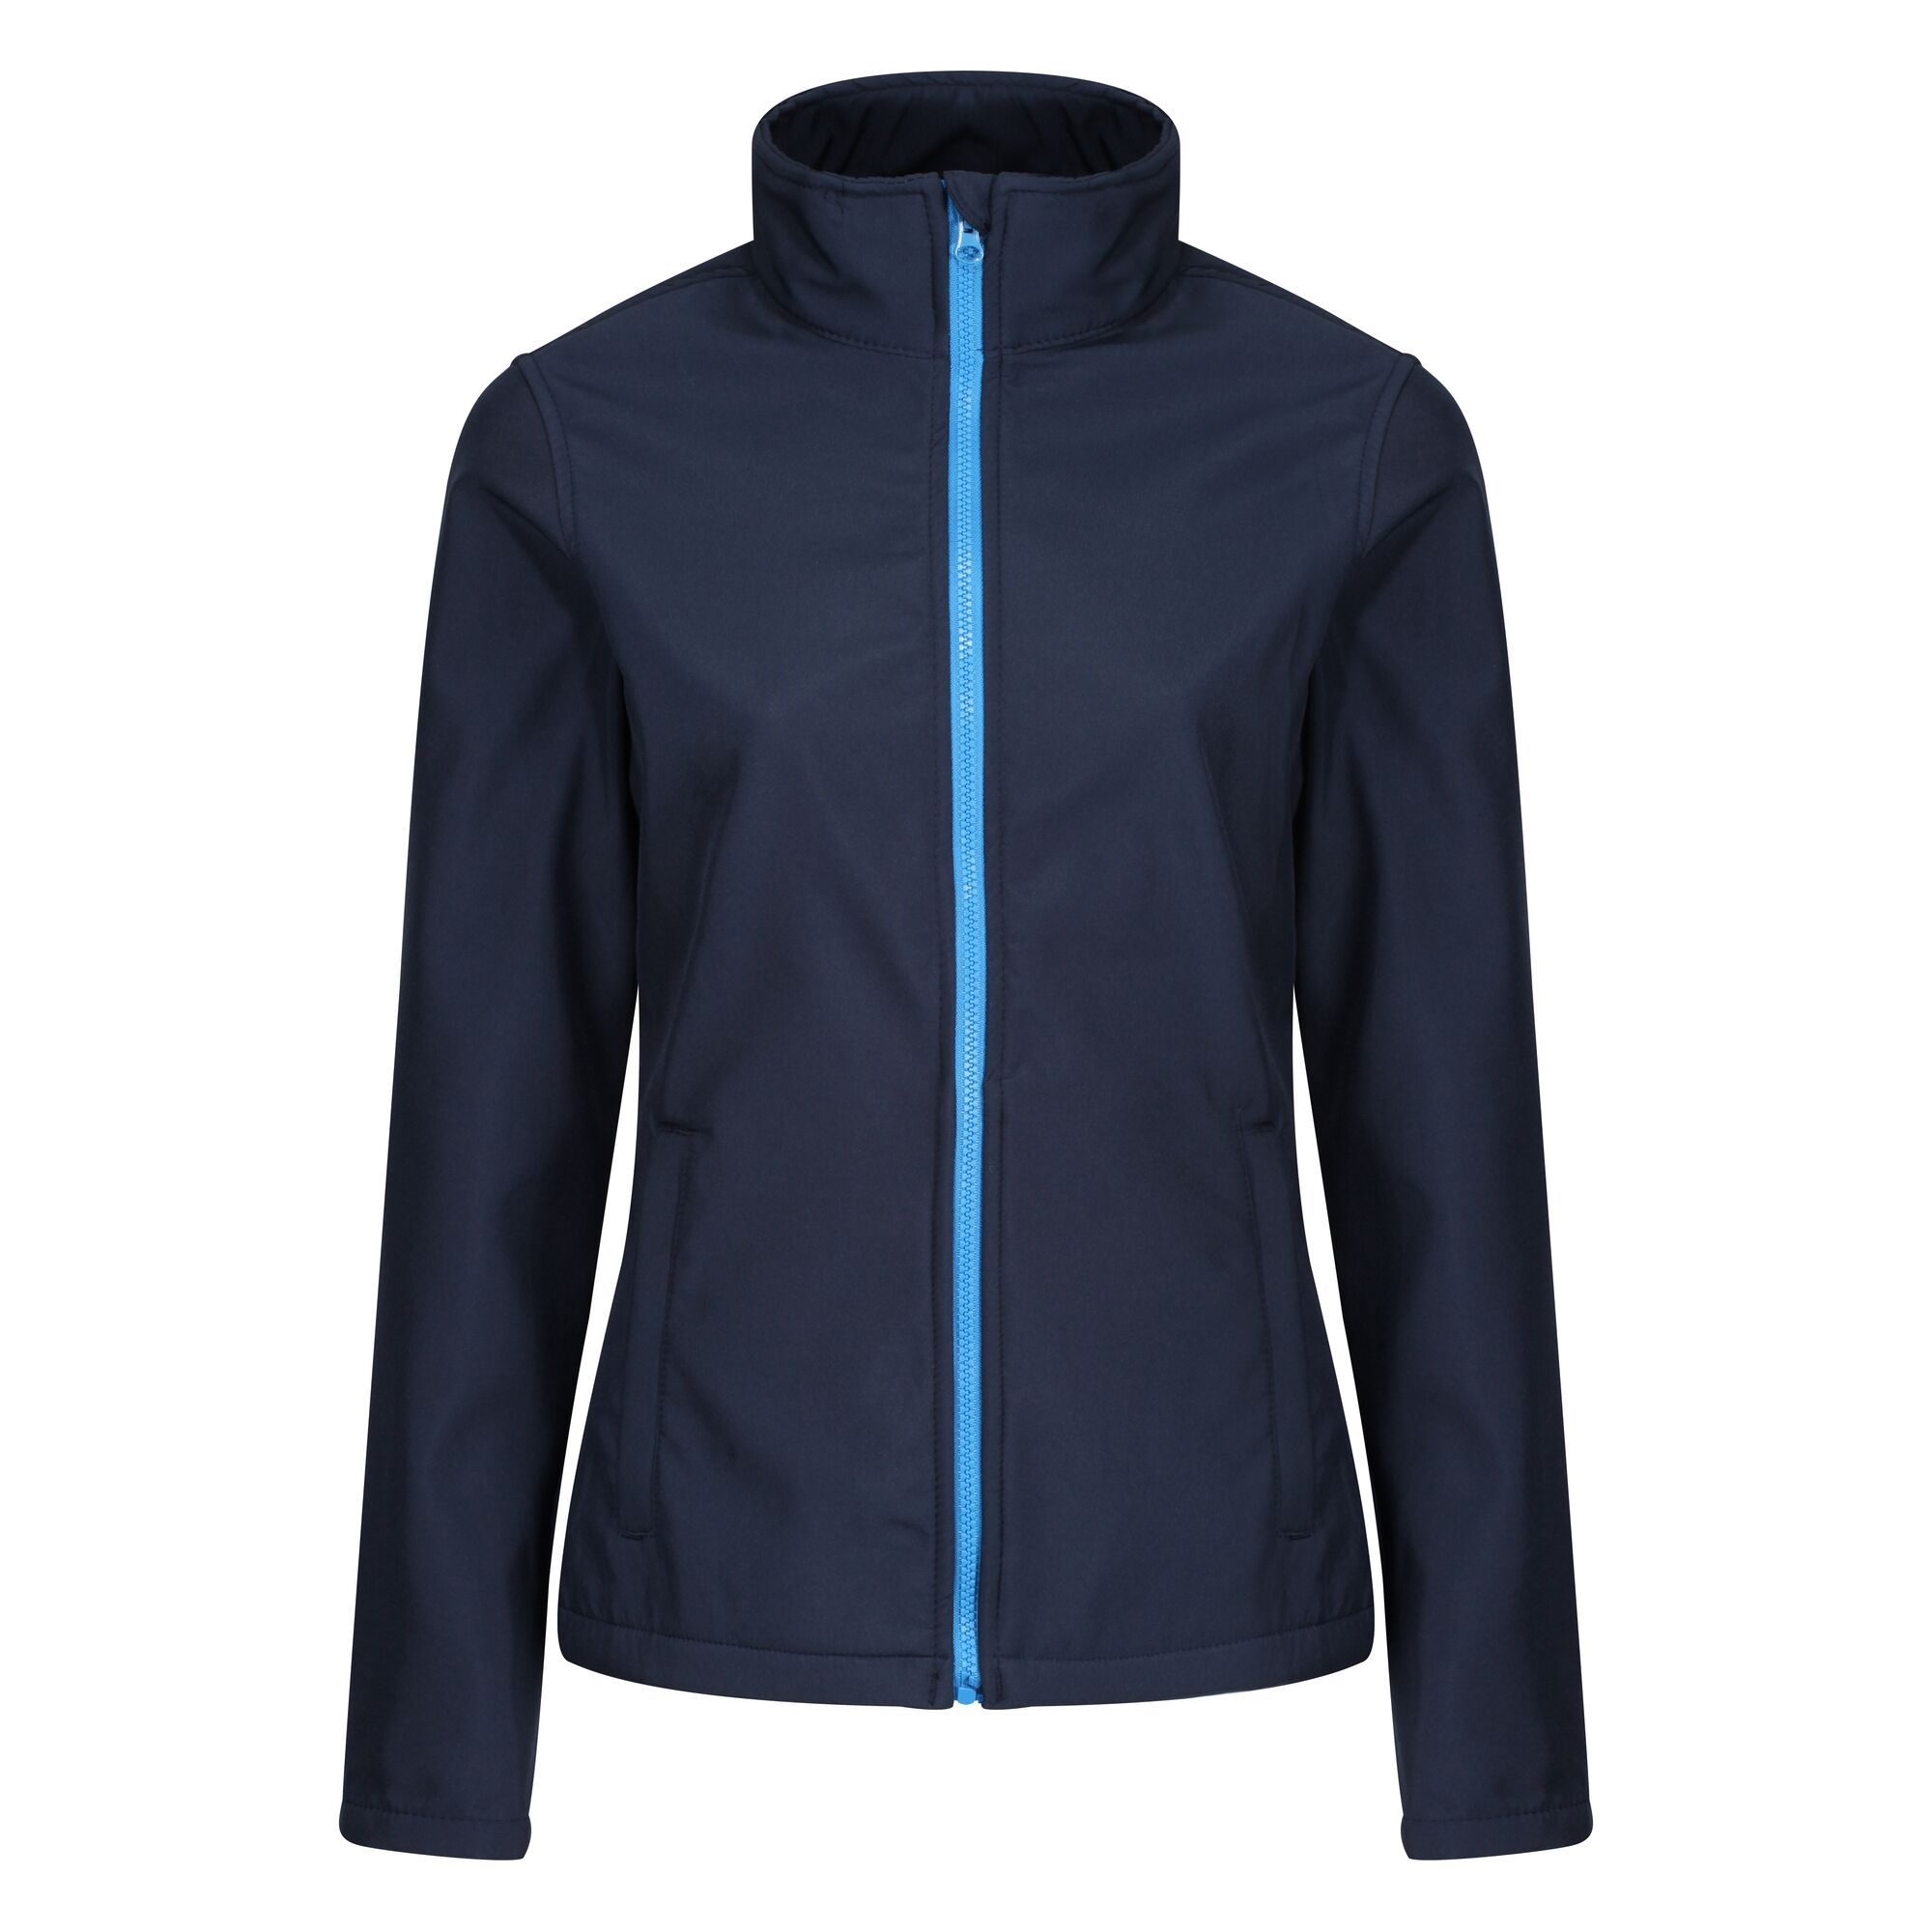 Regatta Standout Womens/Ladies Ablaze Printable Soft Shell Jacket (10) (Royal Blue/Black)